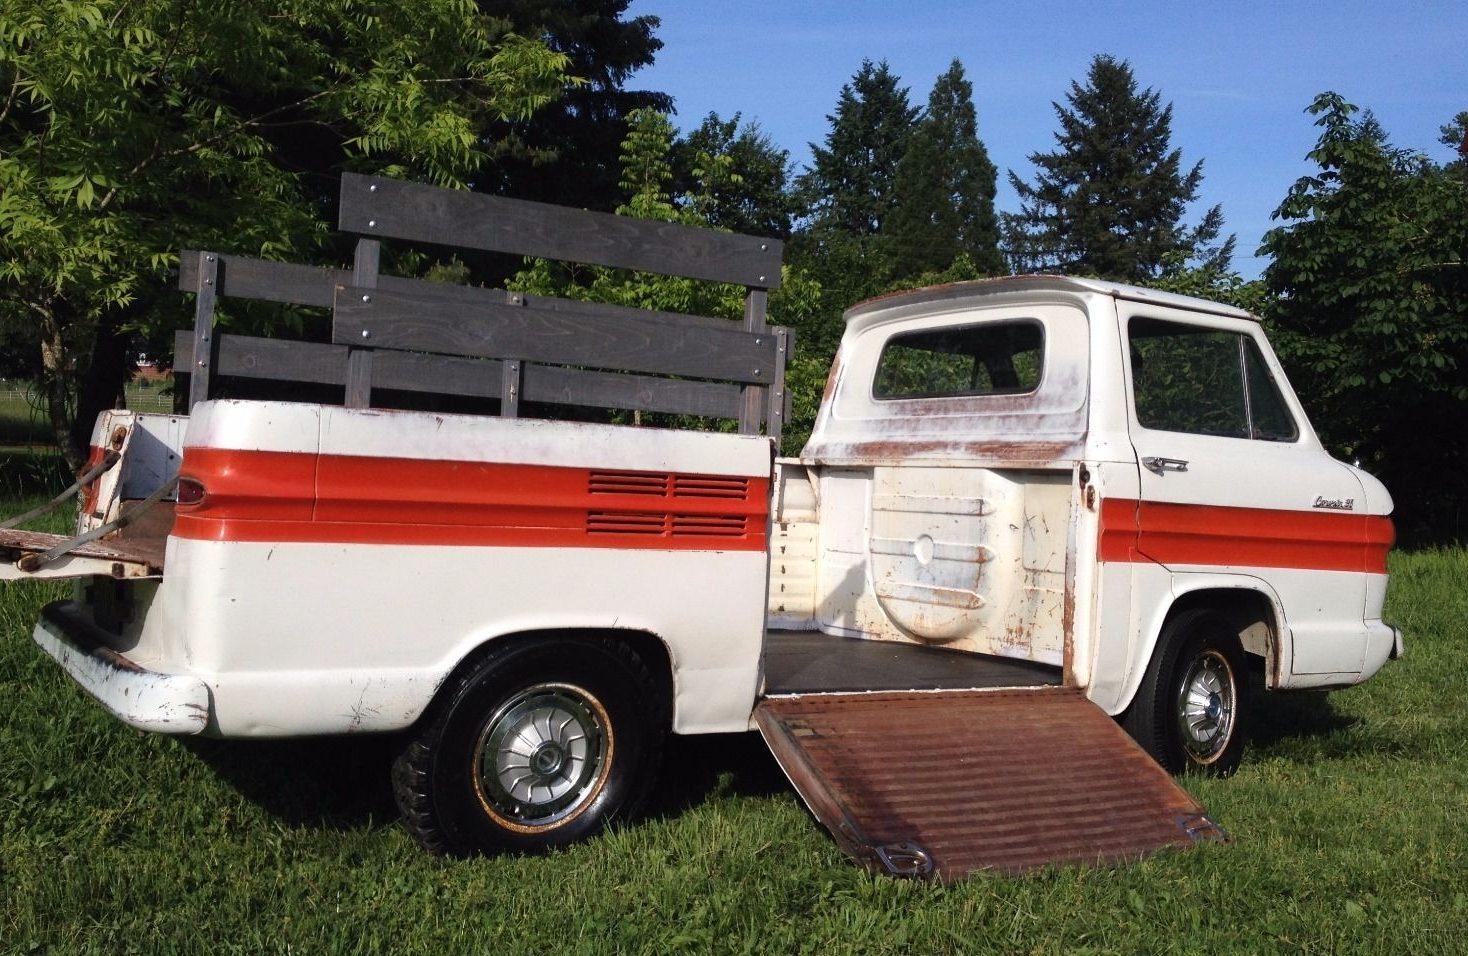 Workhorse Survivor 1961 Corvair Rampside Chevy Pickup Truck